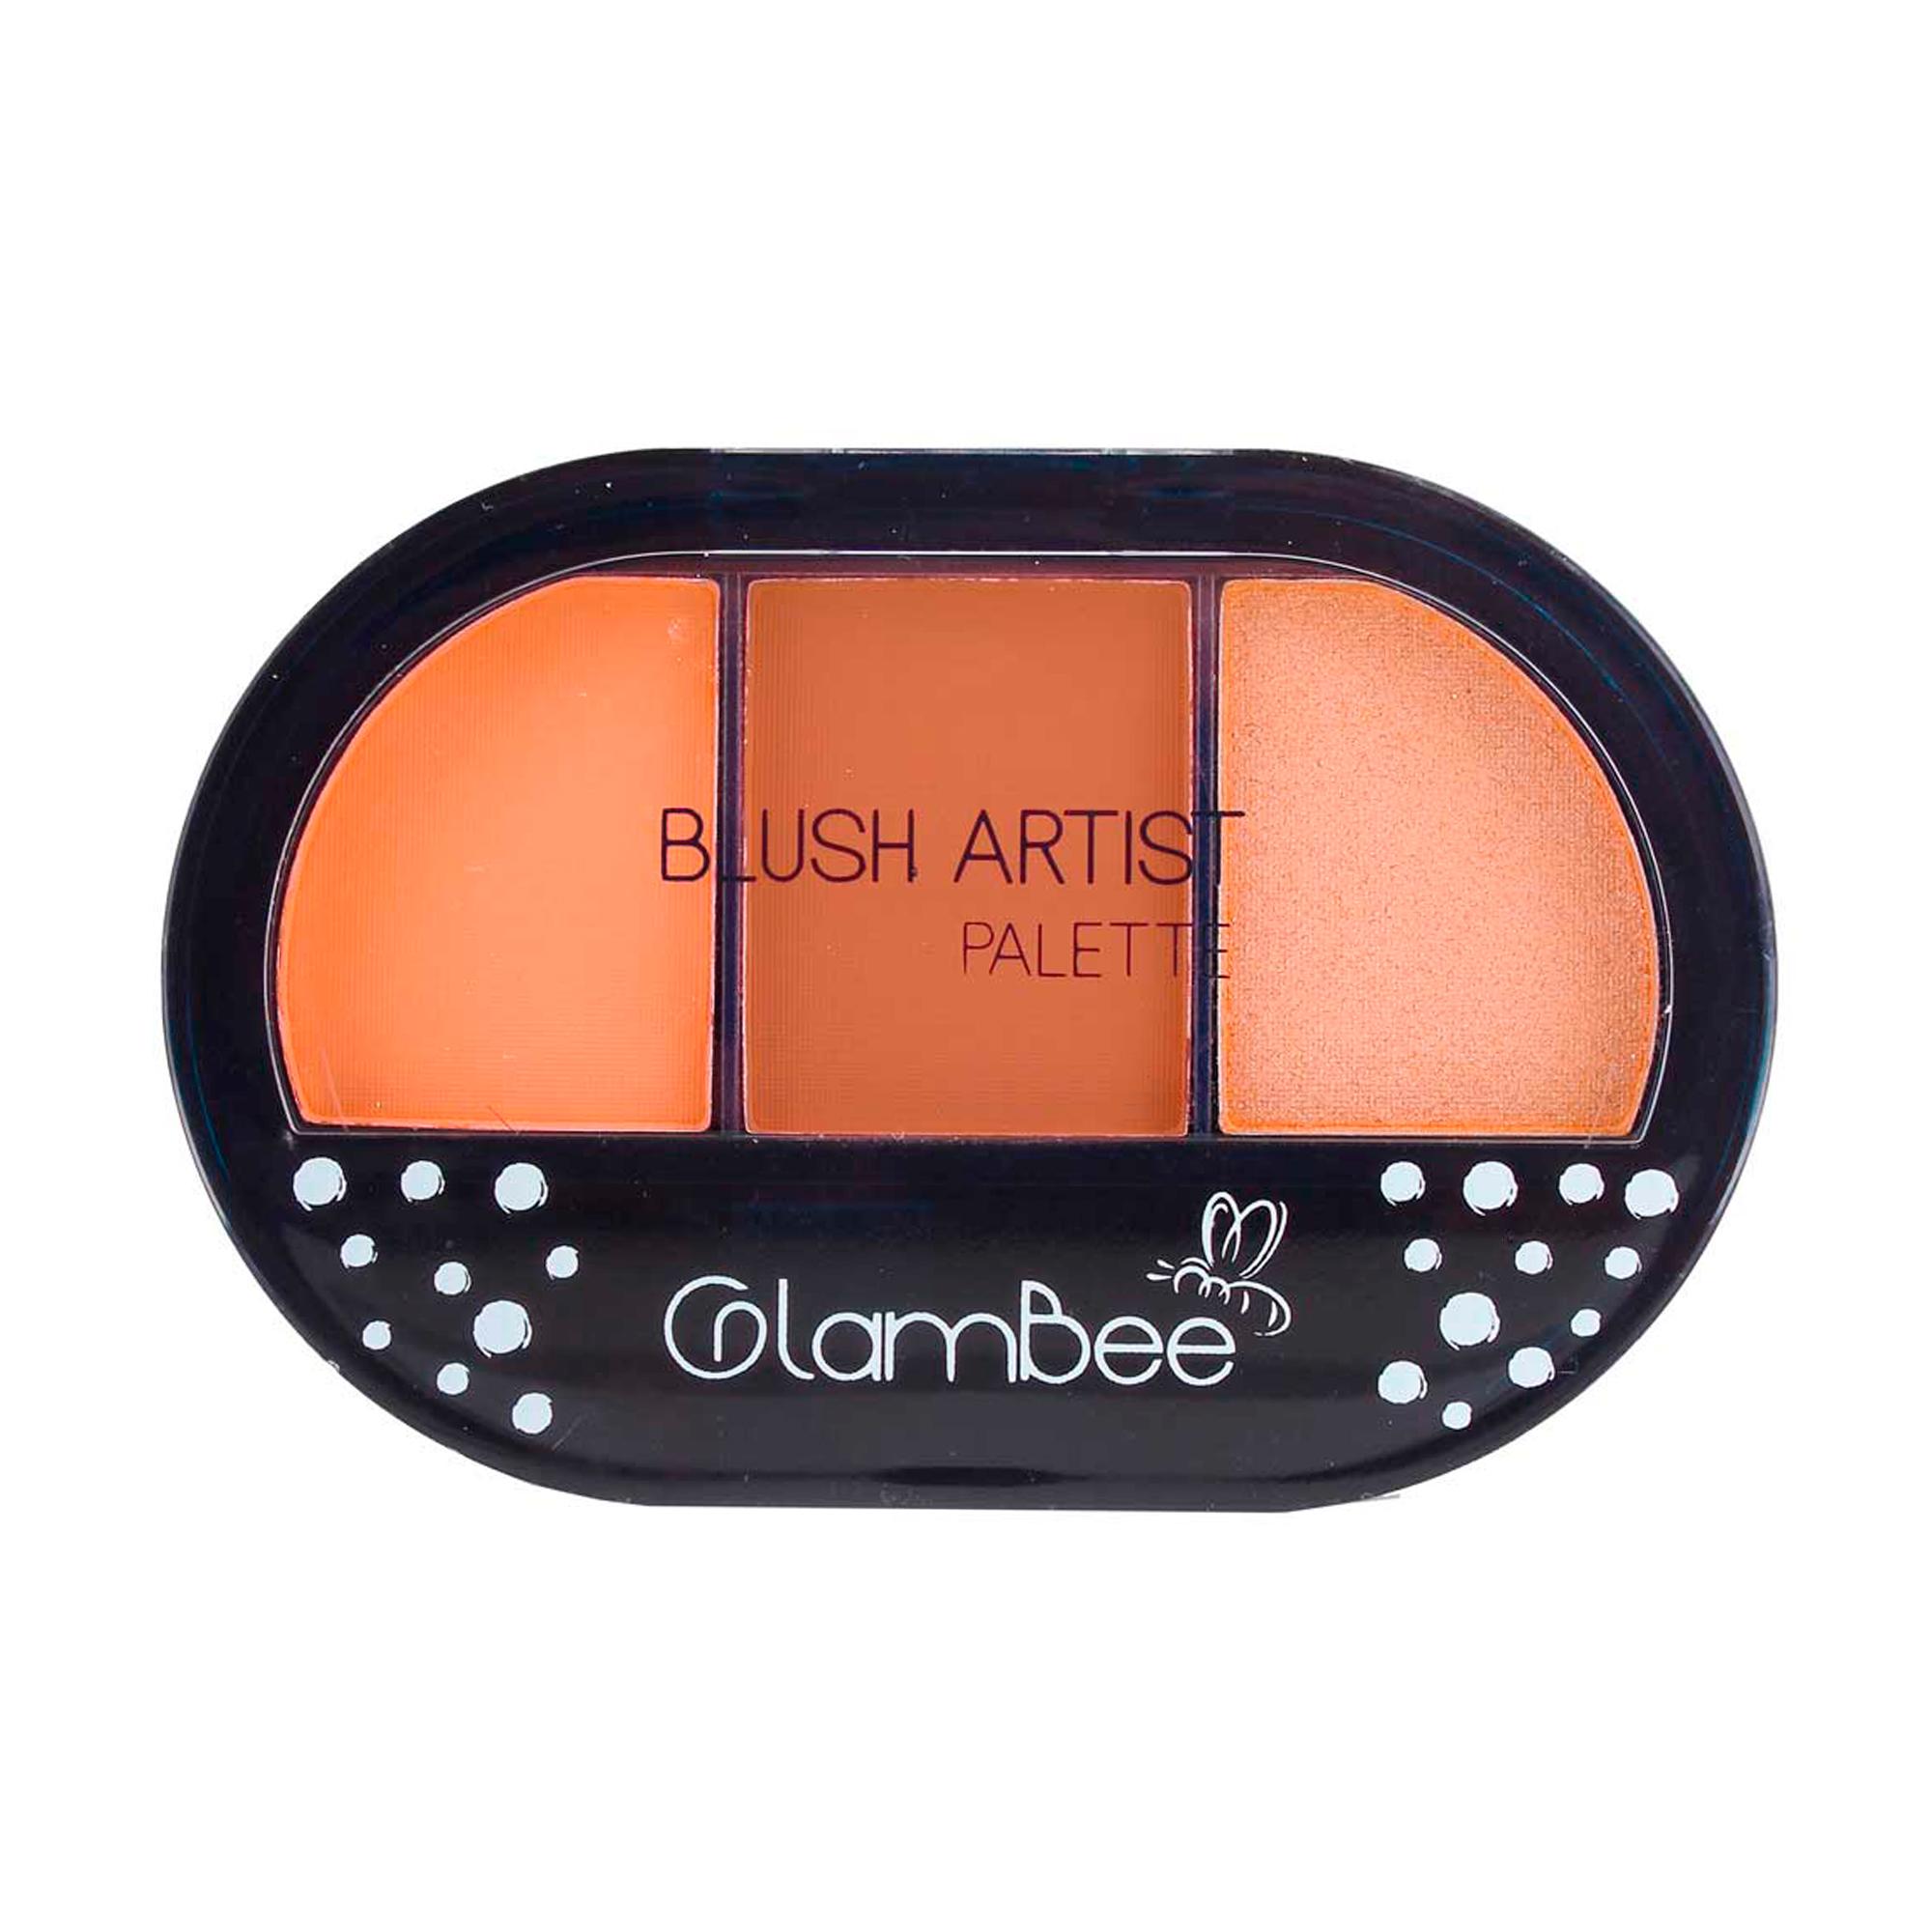 Glam bee косметика купить avon духи incandessence цена